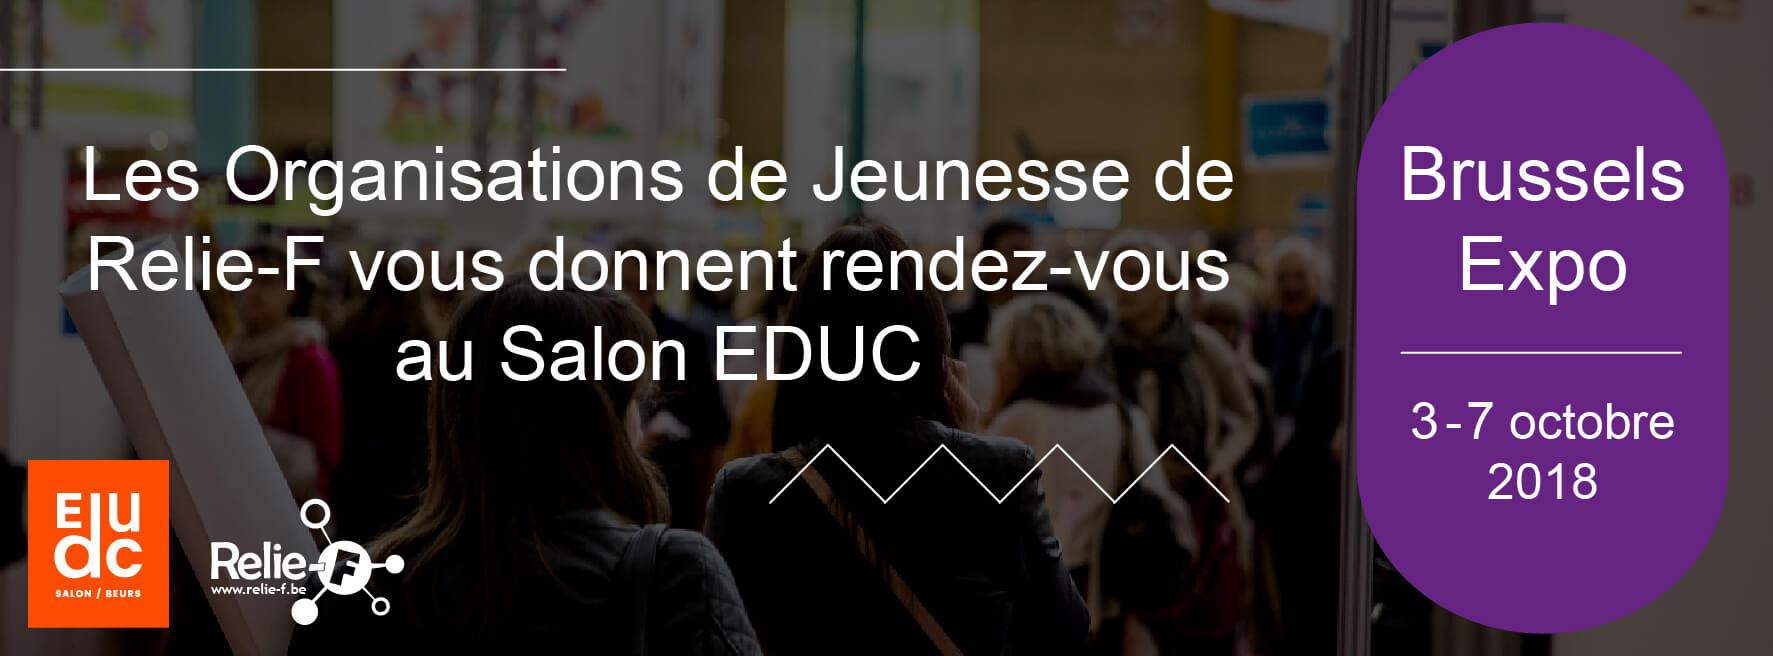 Salon EDUC